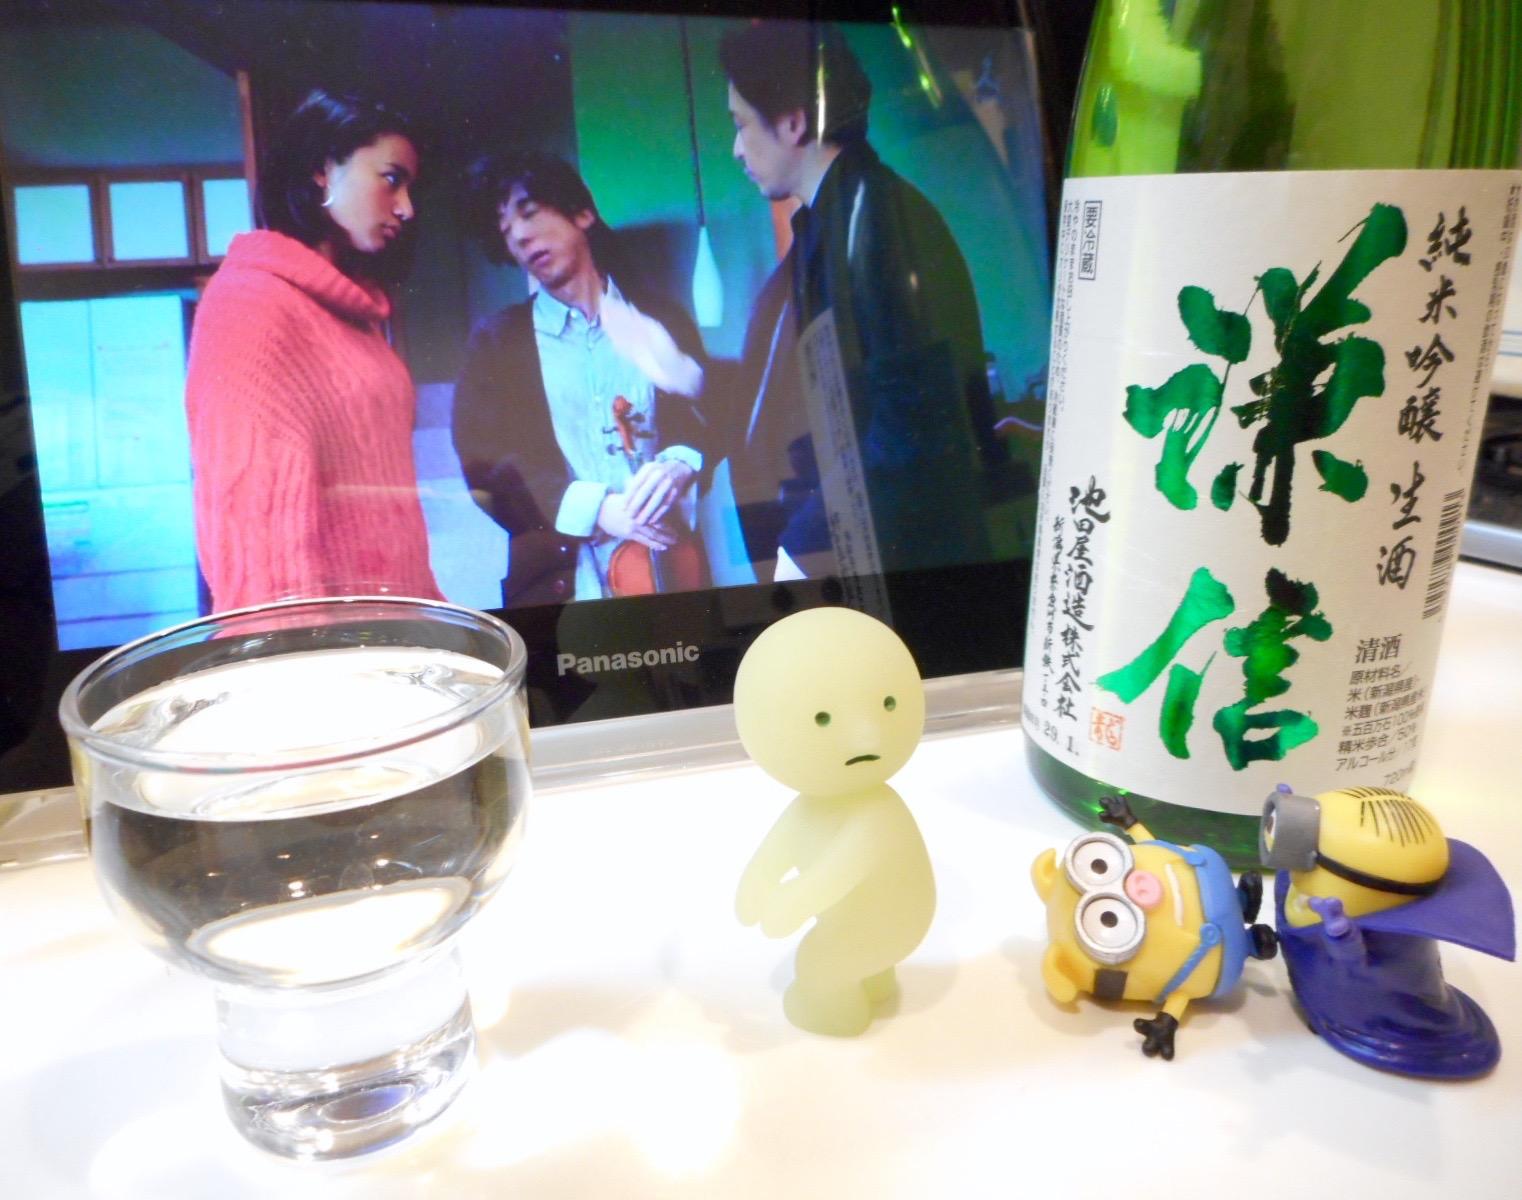 kenshin_jungin_gohyaku_nama28by4.jpg